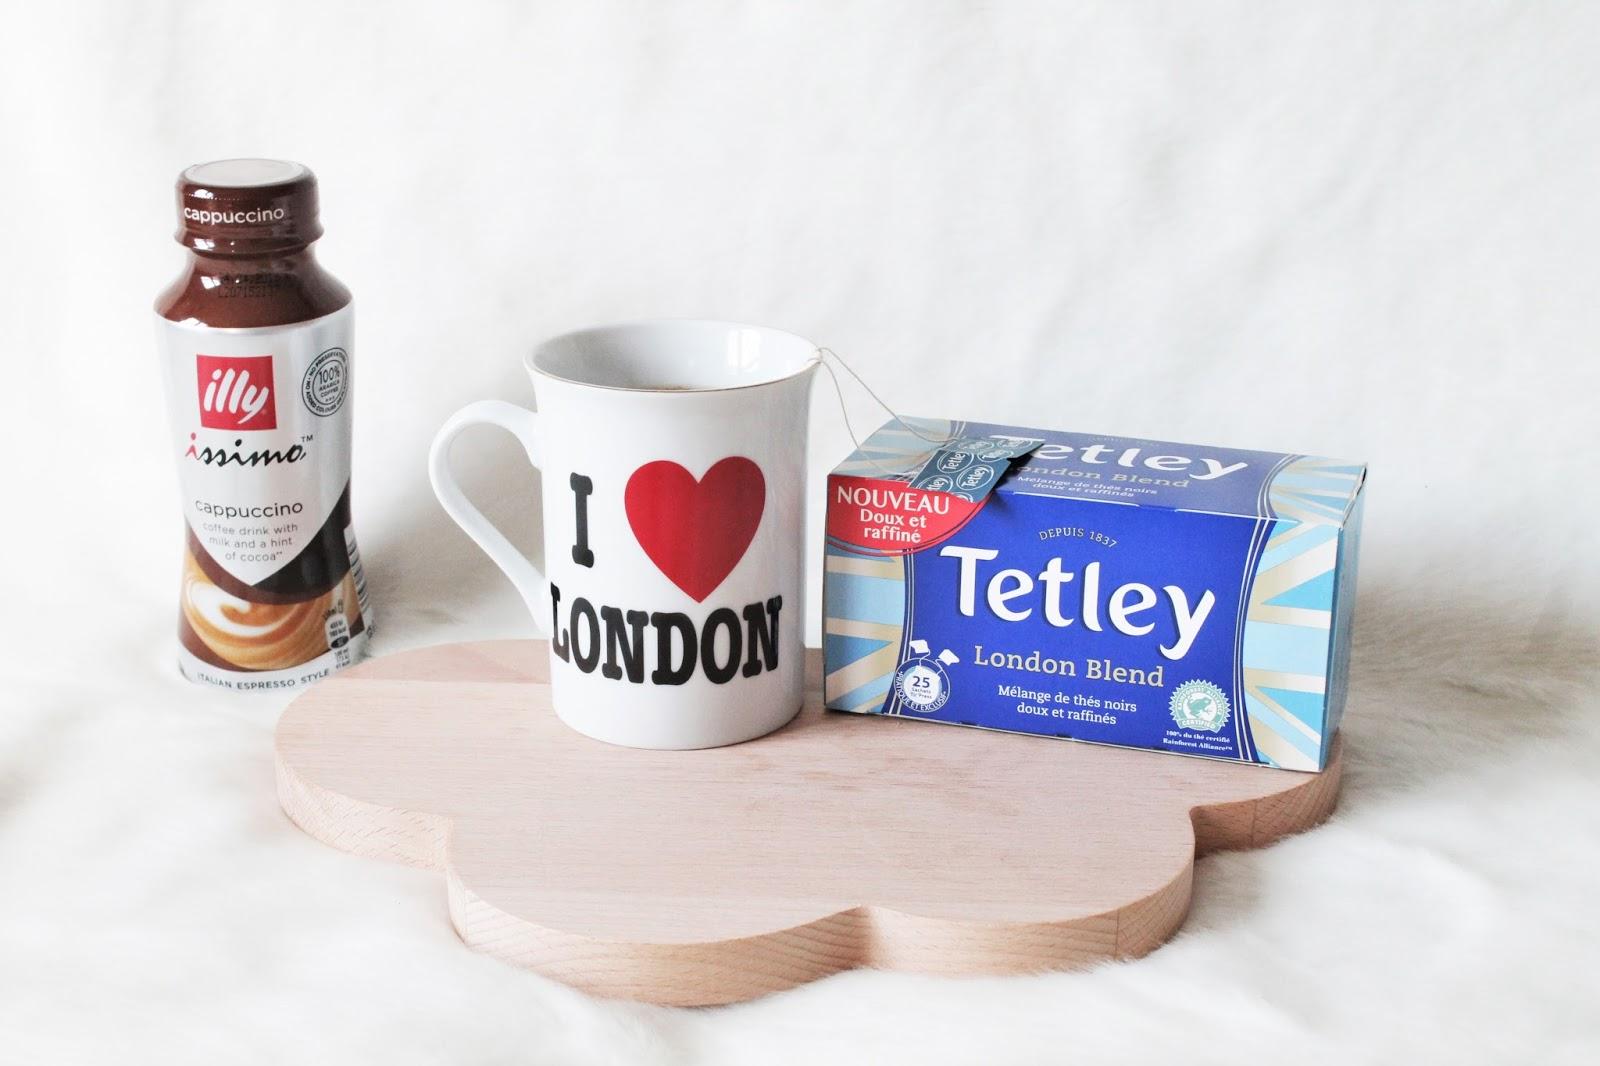 degustabox box food fevrier 2016 code promo bon plan reduc parrainage offert parrain breakfast illy tetley london teatime